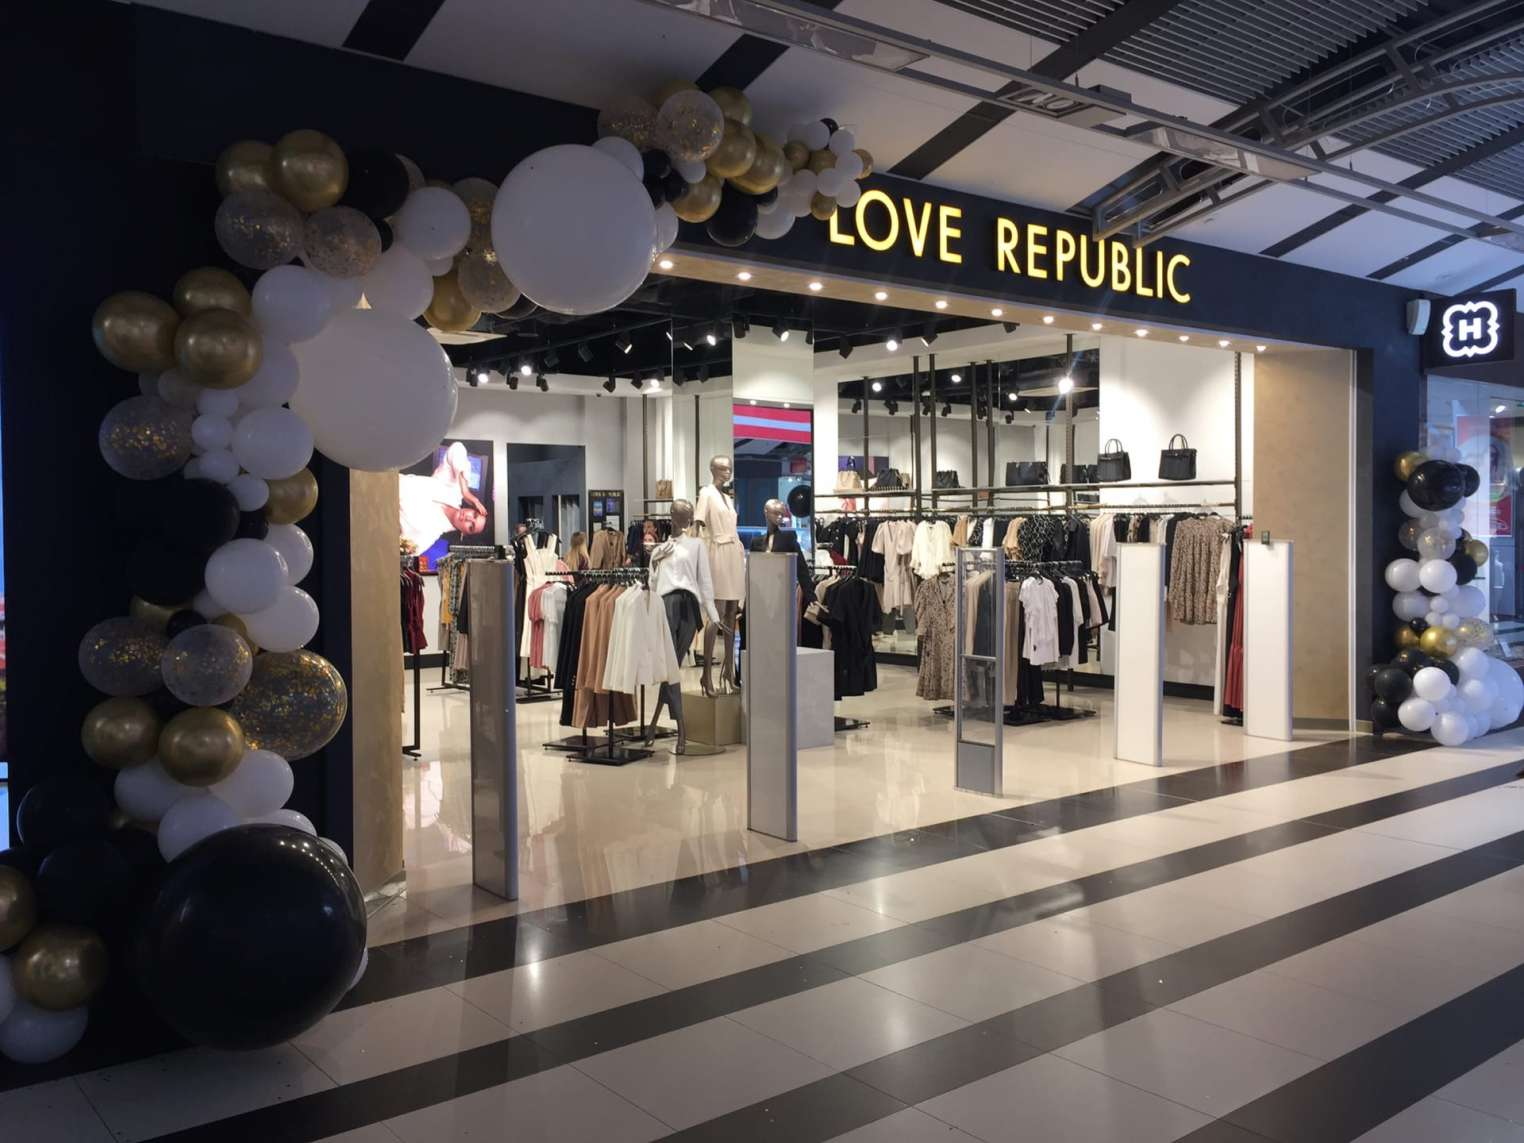 LOVE REPUBLIC в ТРК Петровский